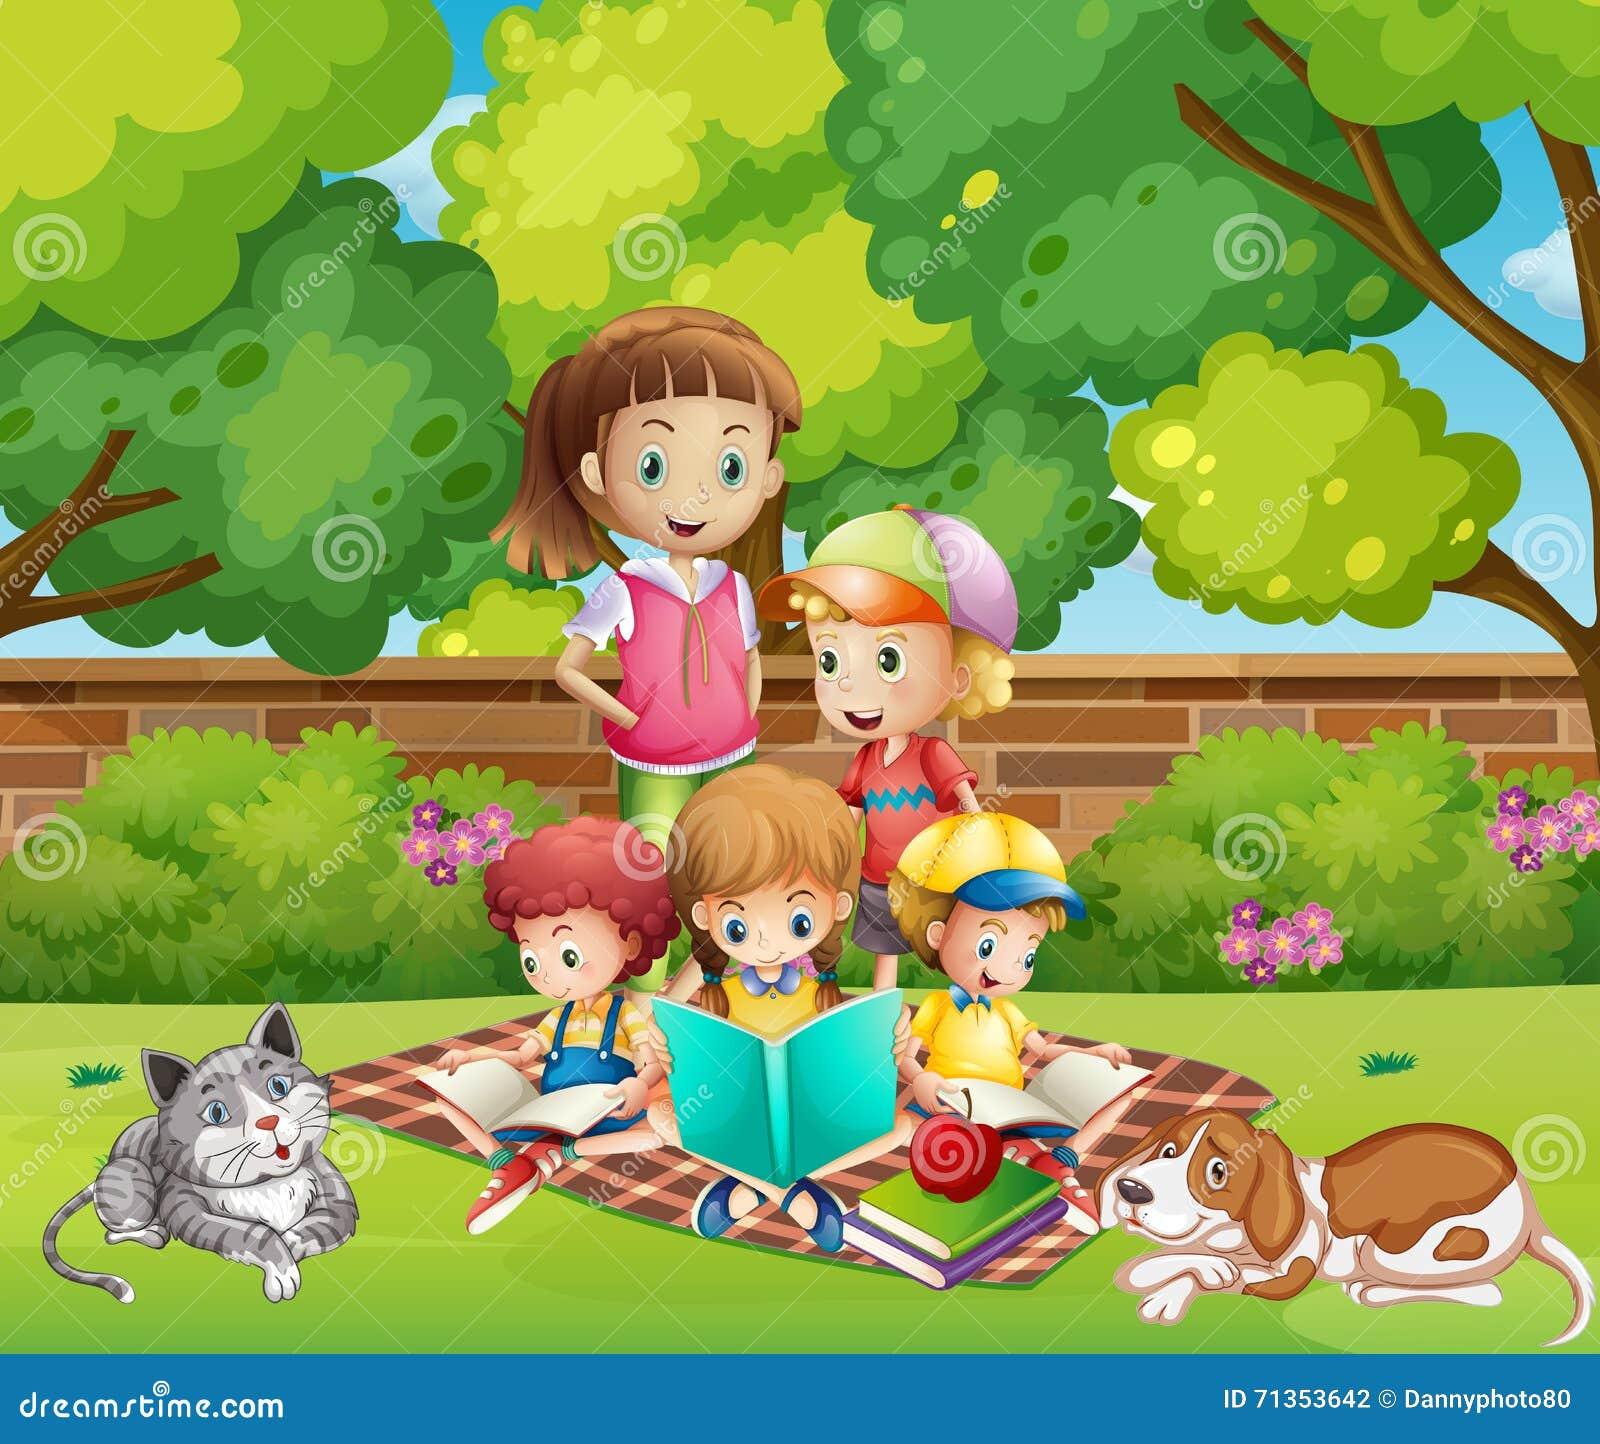 Children Reading Books In The Garden Picture Illustration